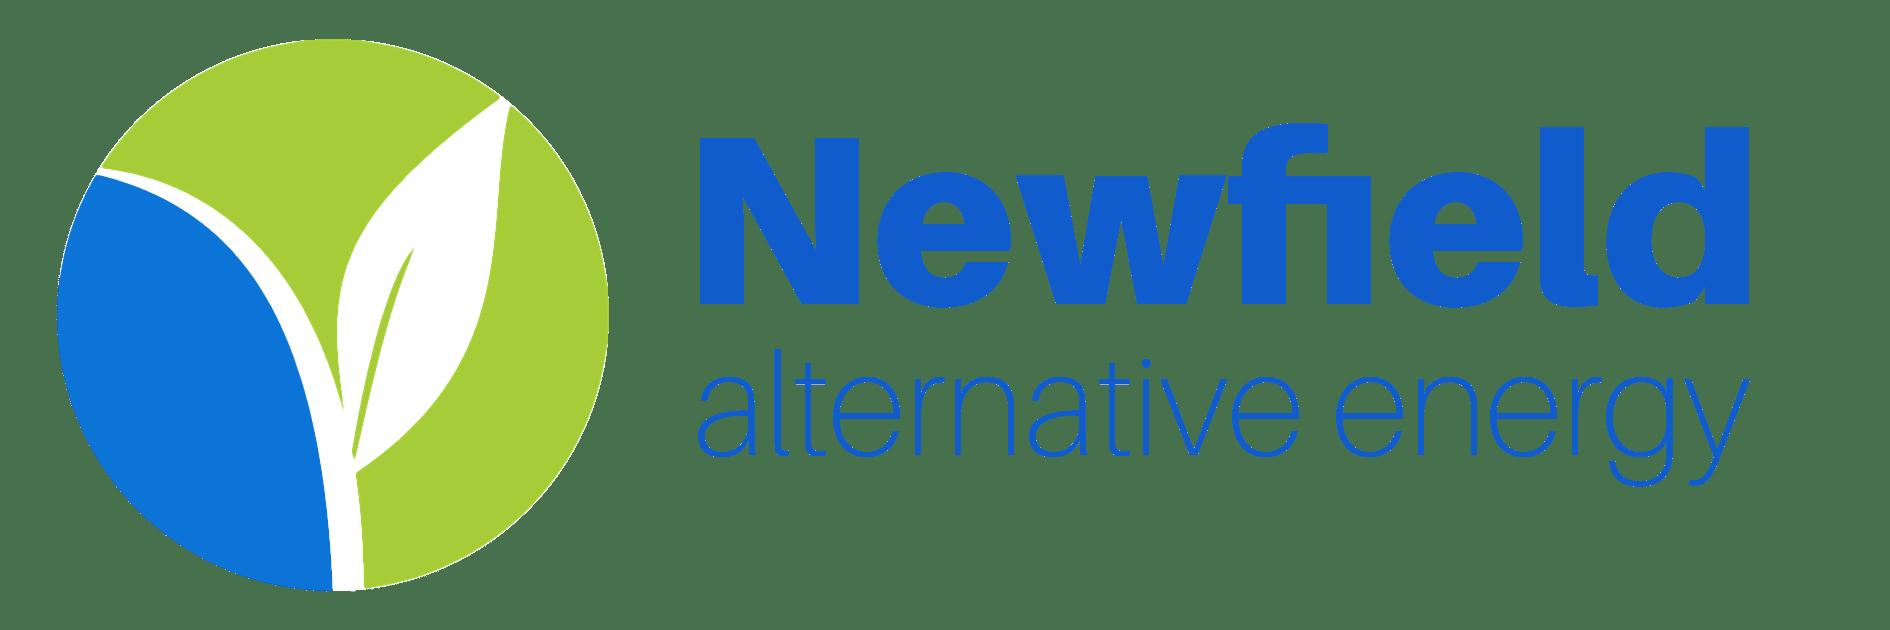 Newfield Alternative Energy